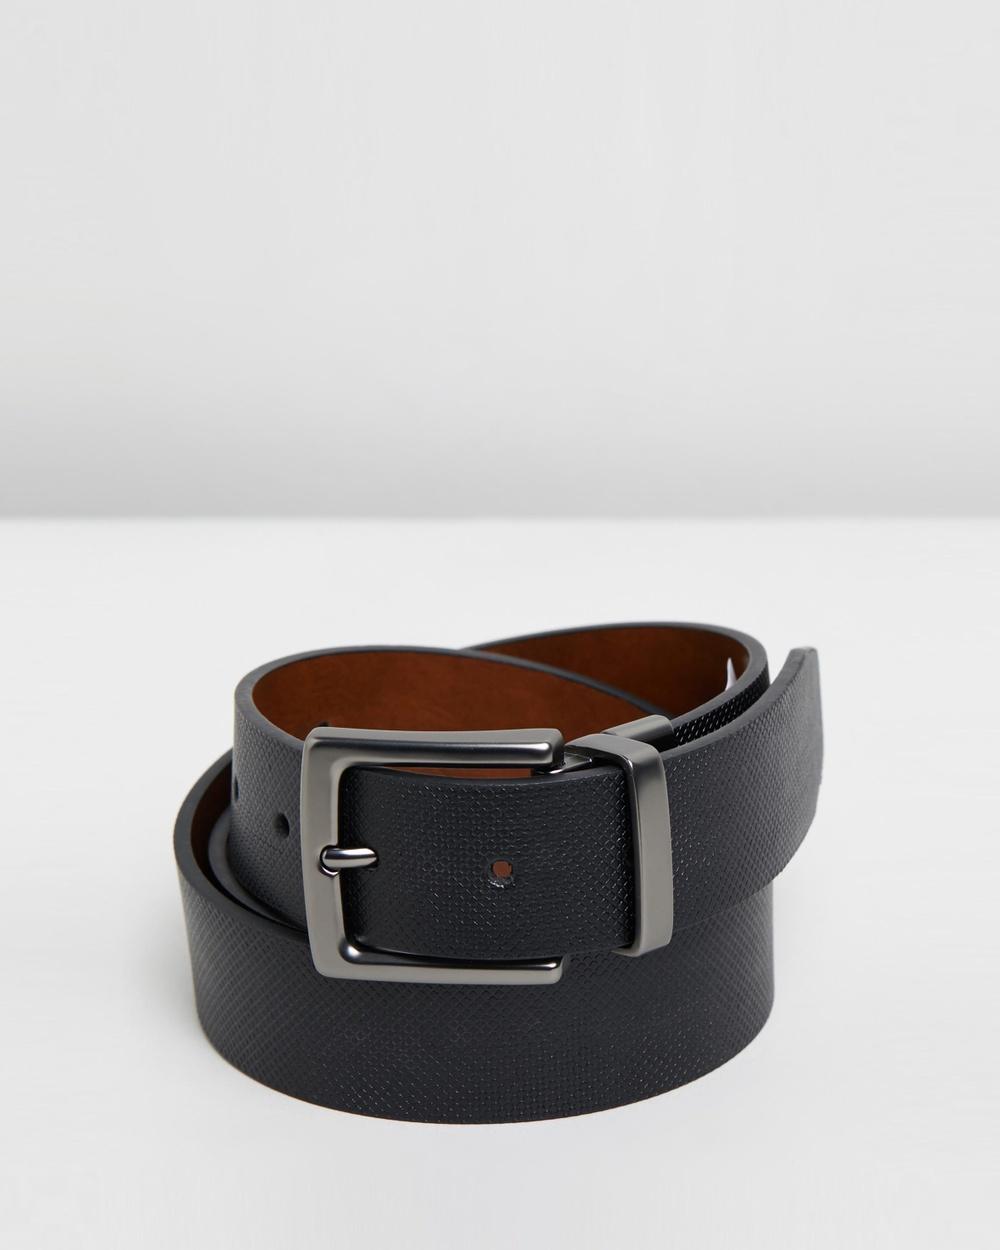 Ben Sherman Reversible Casual Belt Belts Black & Tan